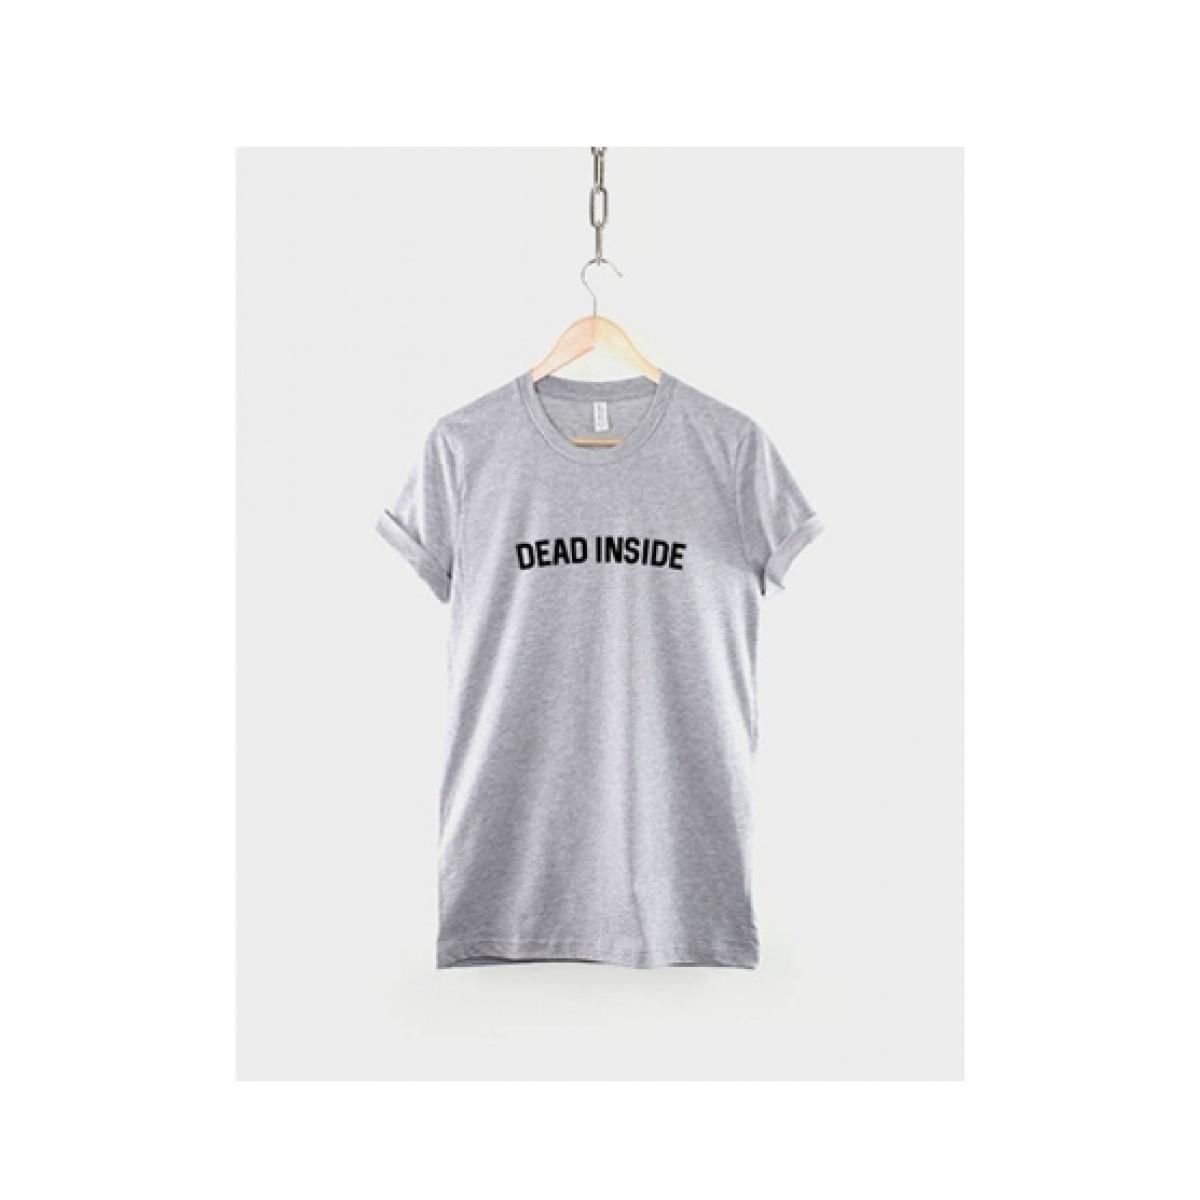 Khanani's Printed T-Shirt For Unisex Grey (0095)